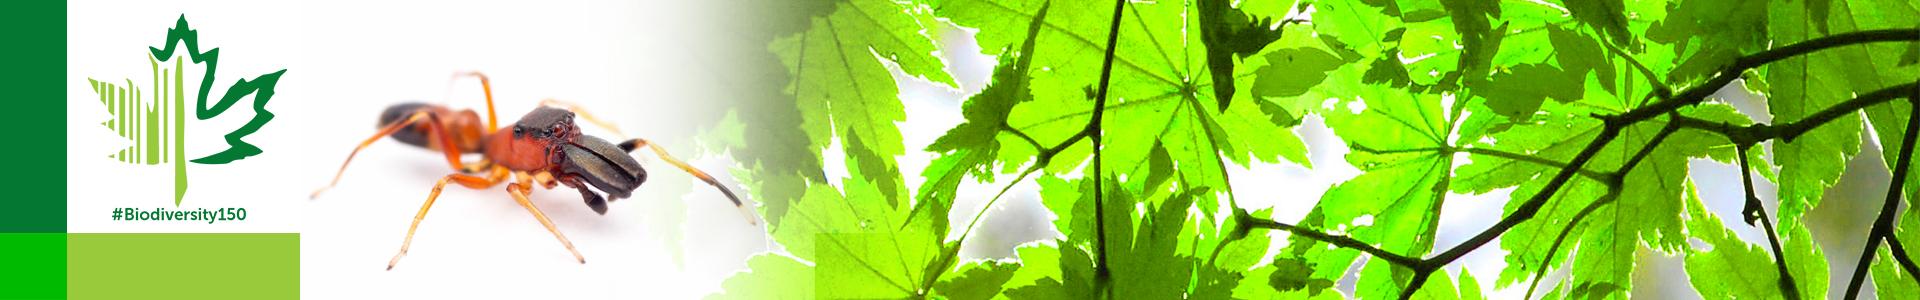 #Biodiversity150 number 110 of 150 Myrmarachne formicaria